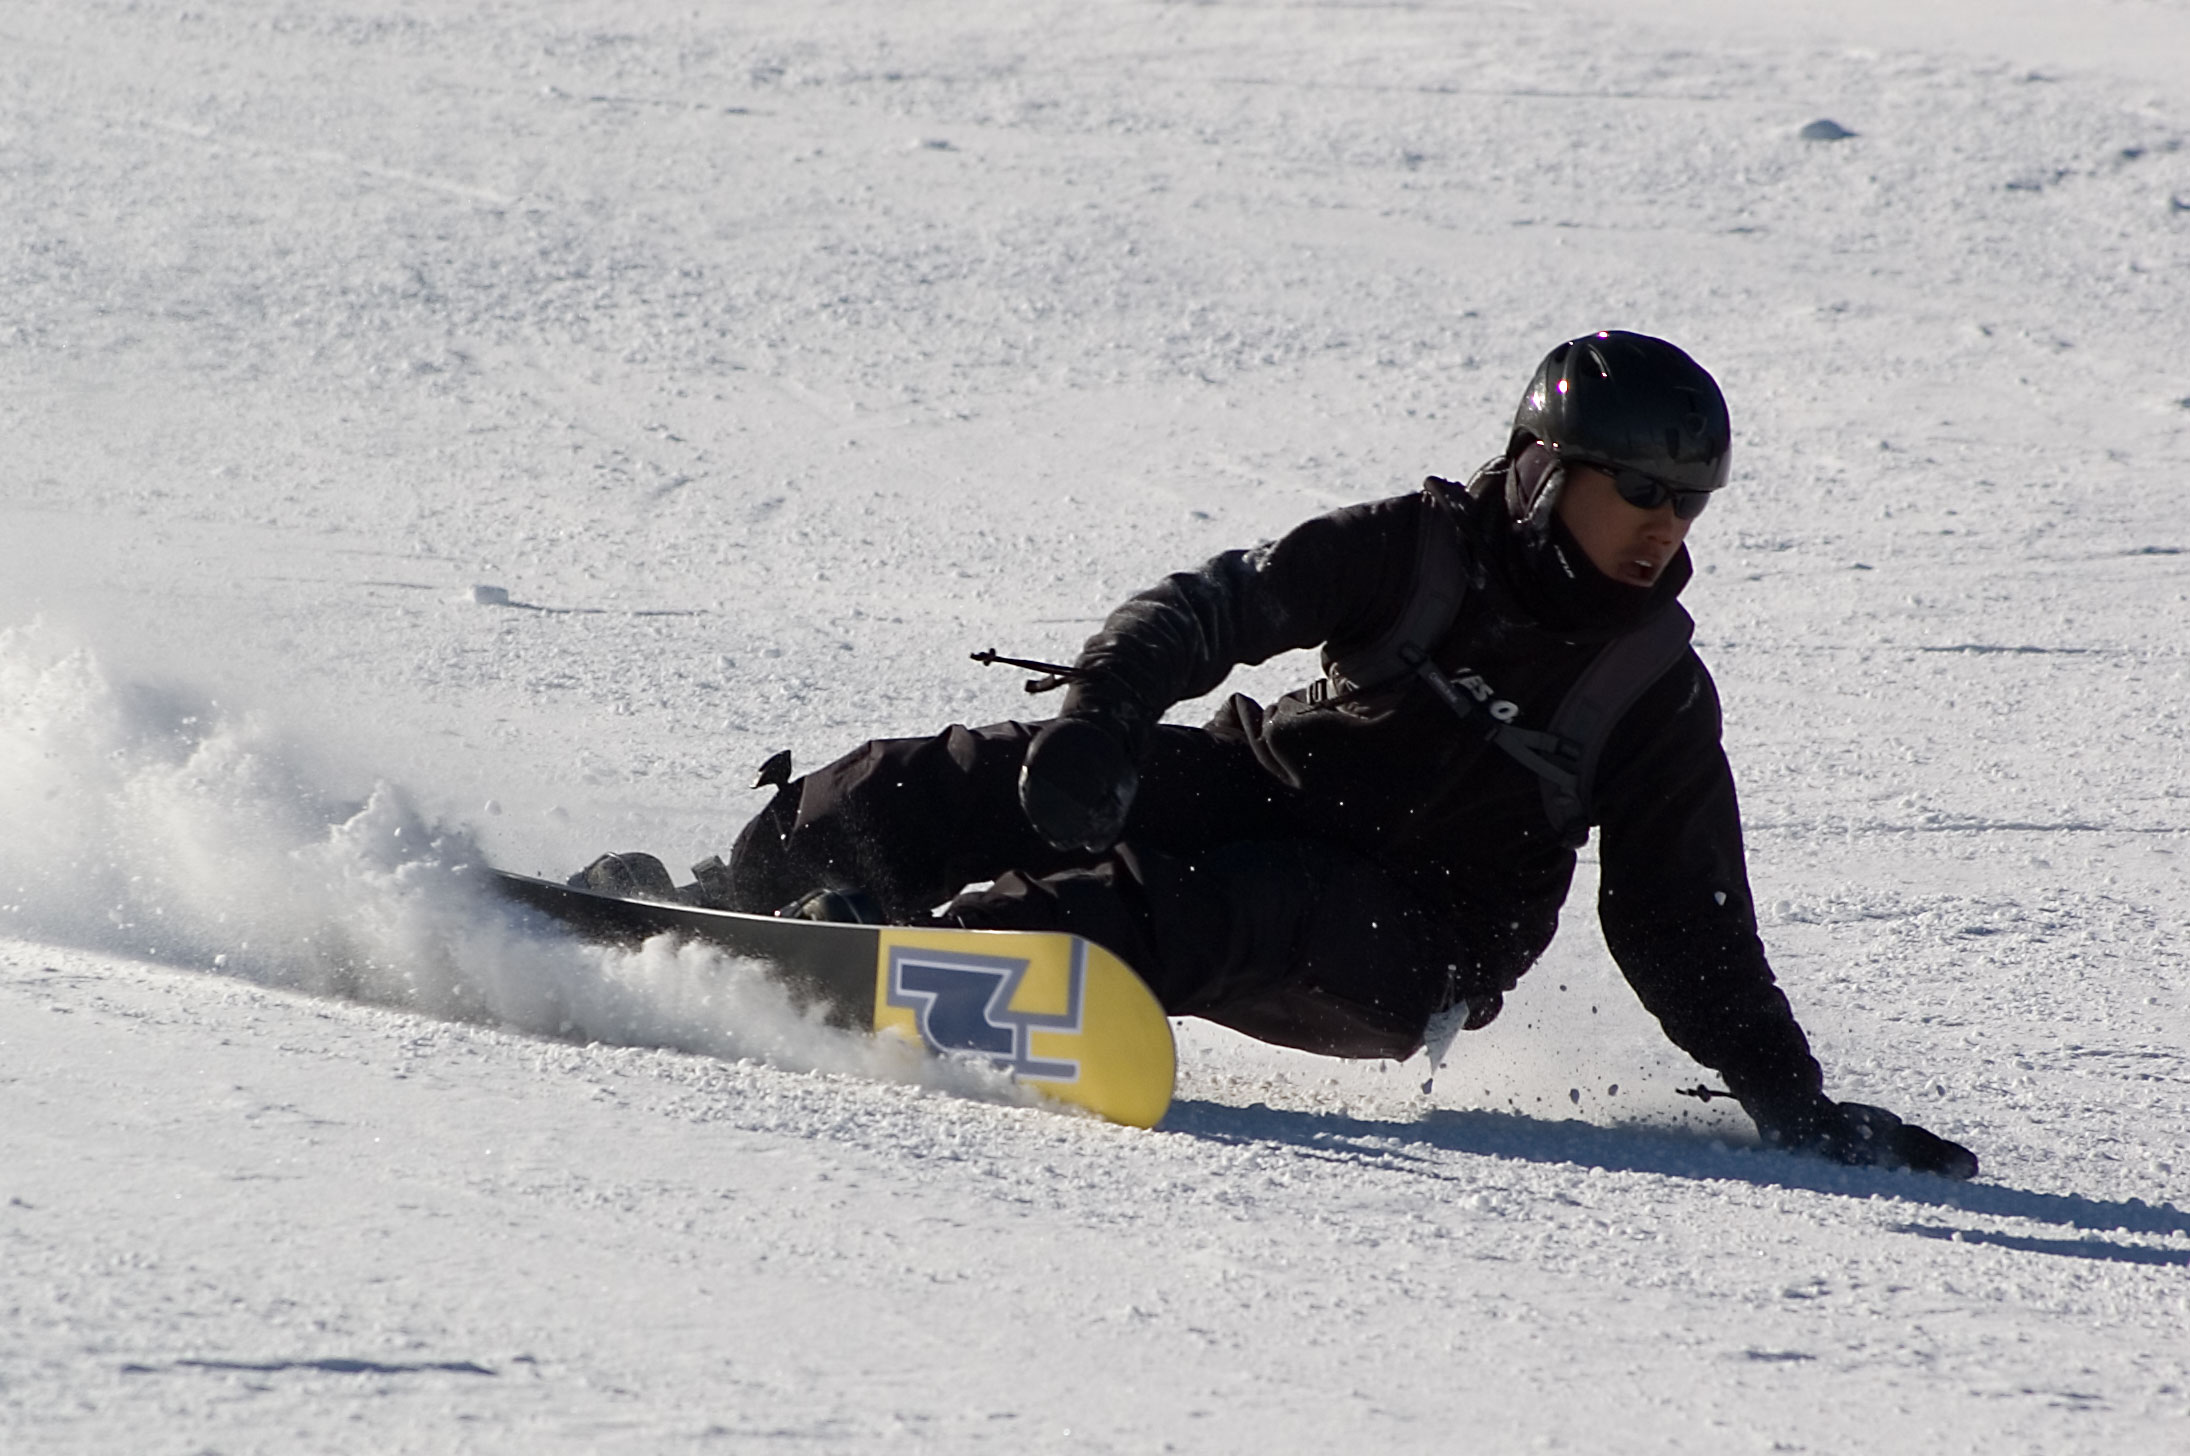 Center of mass snowboarding forum snowboard enthusiast